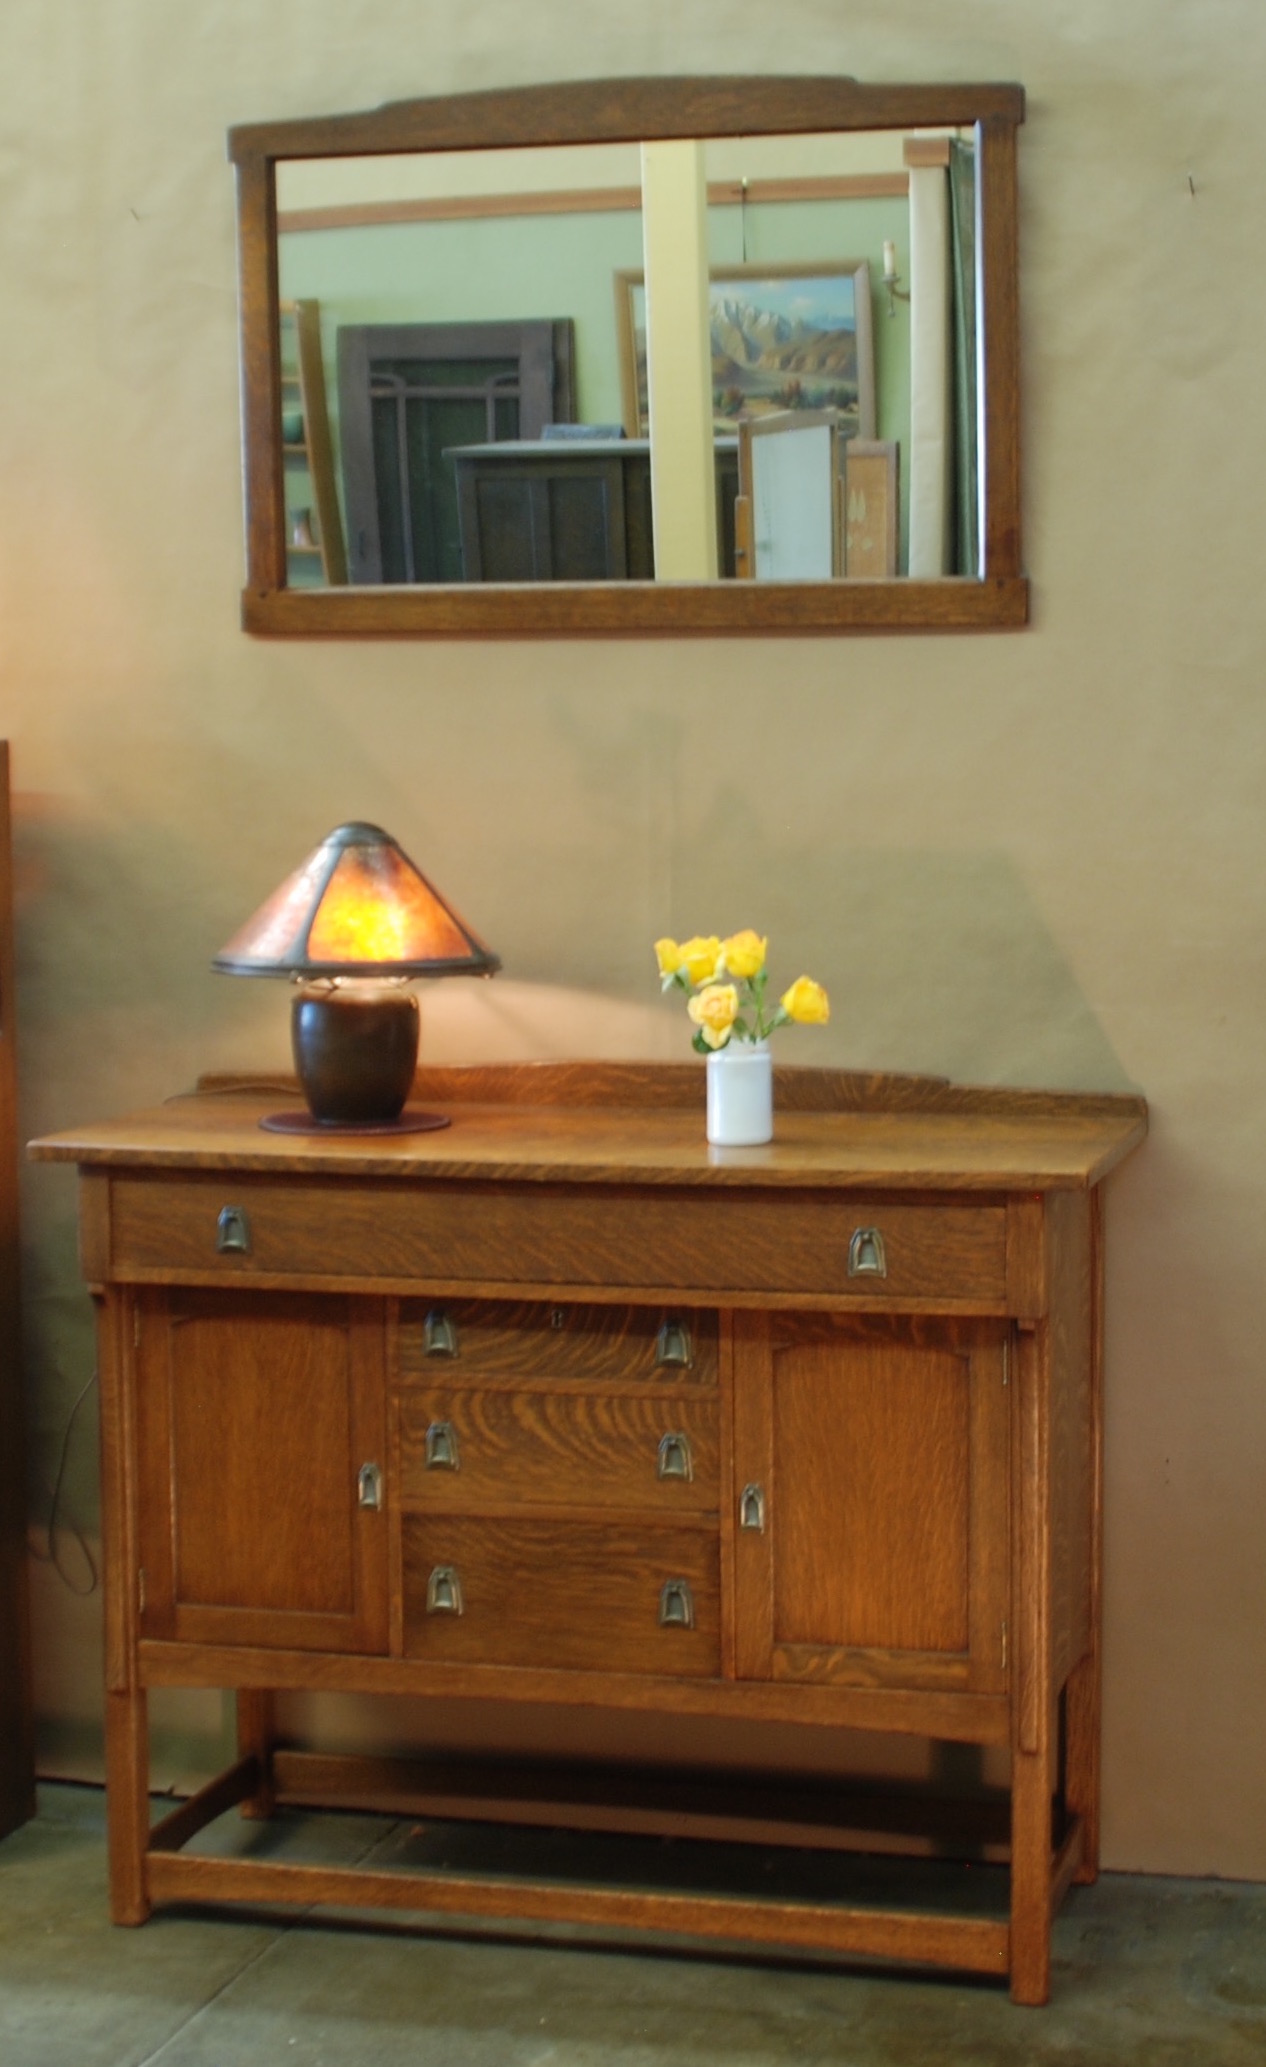 voorhees craftsman mission oak furniture - lifetime furniture